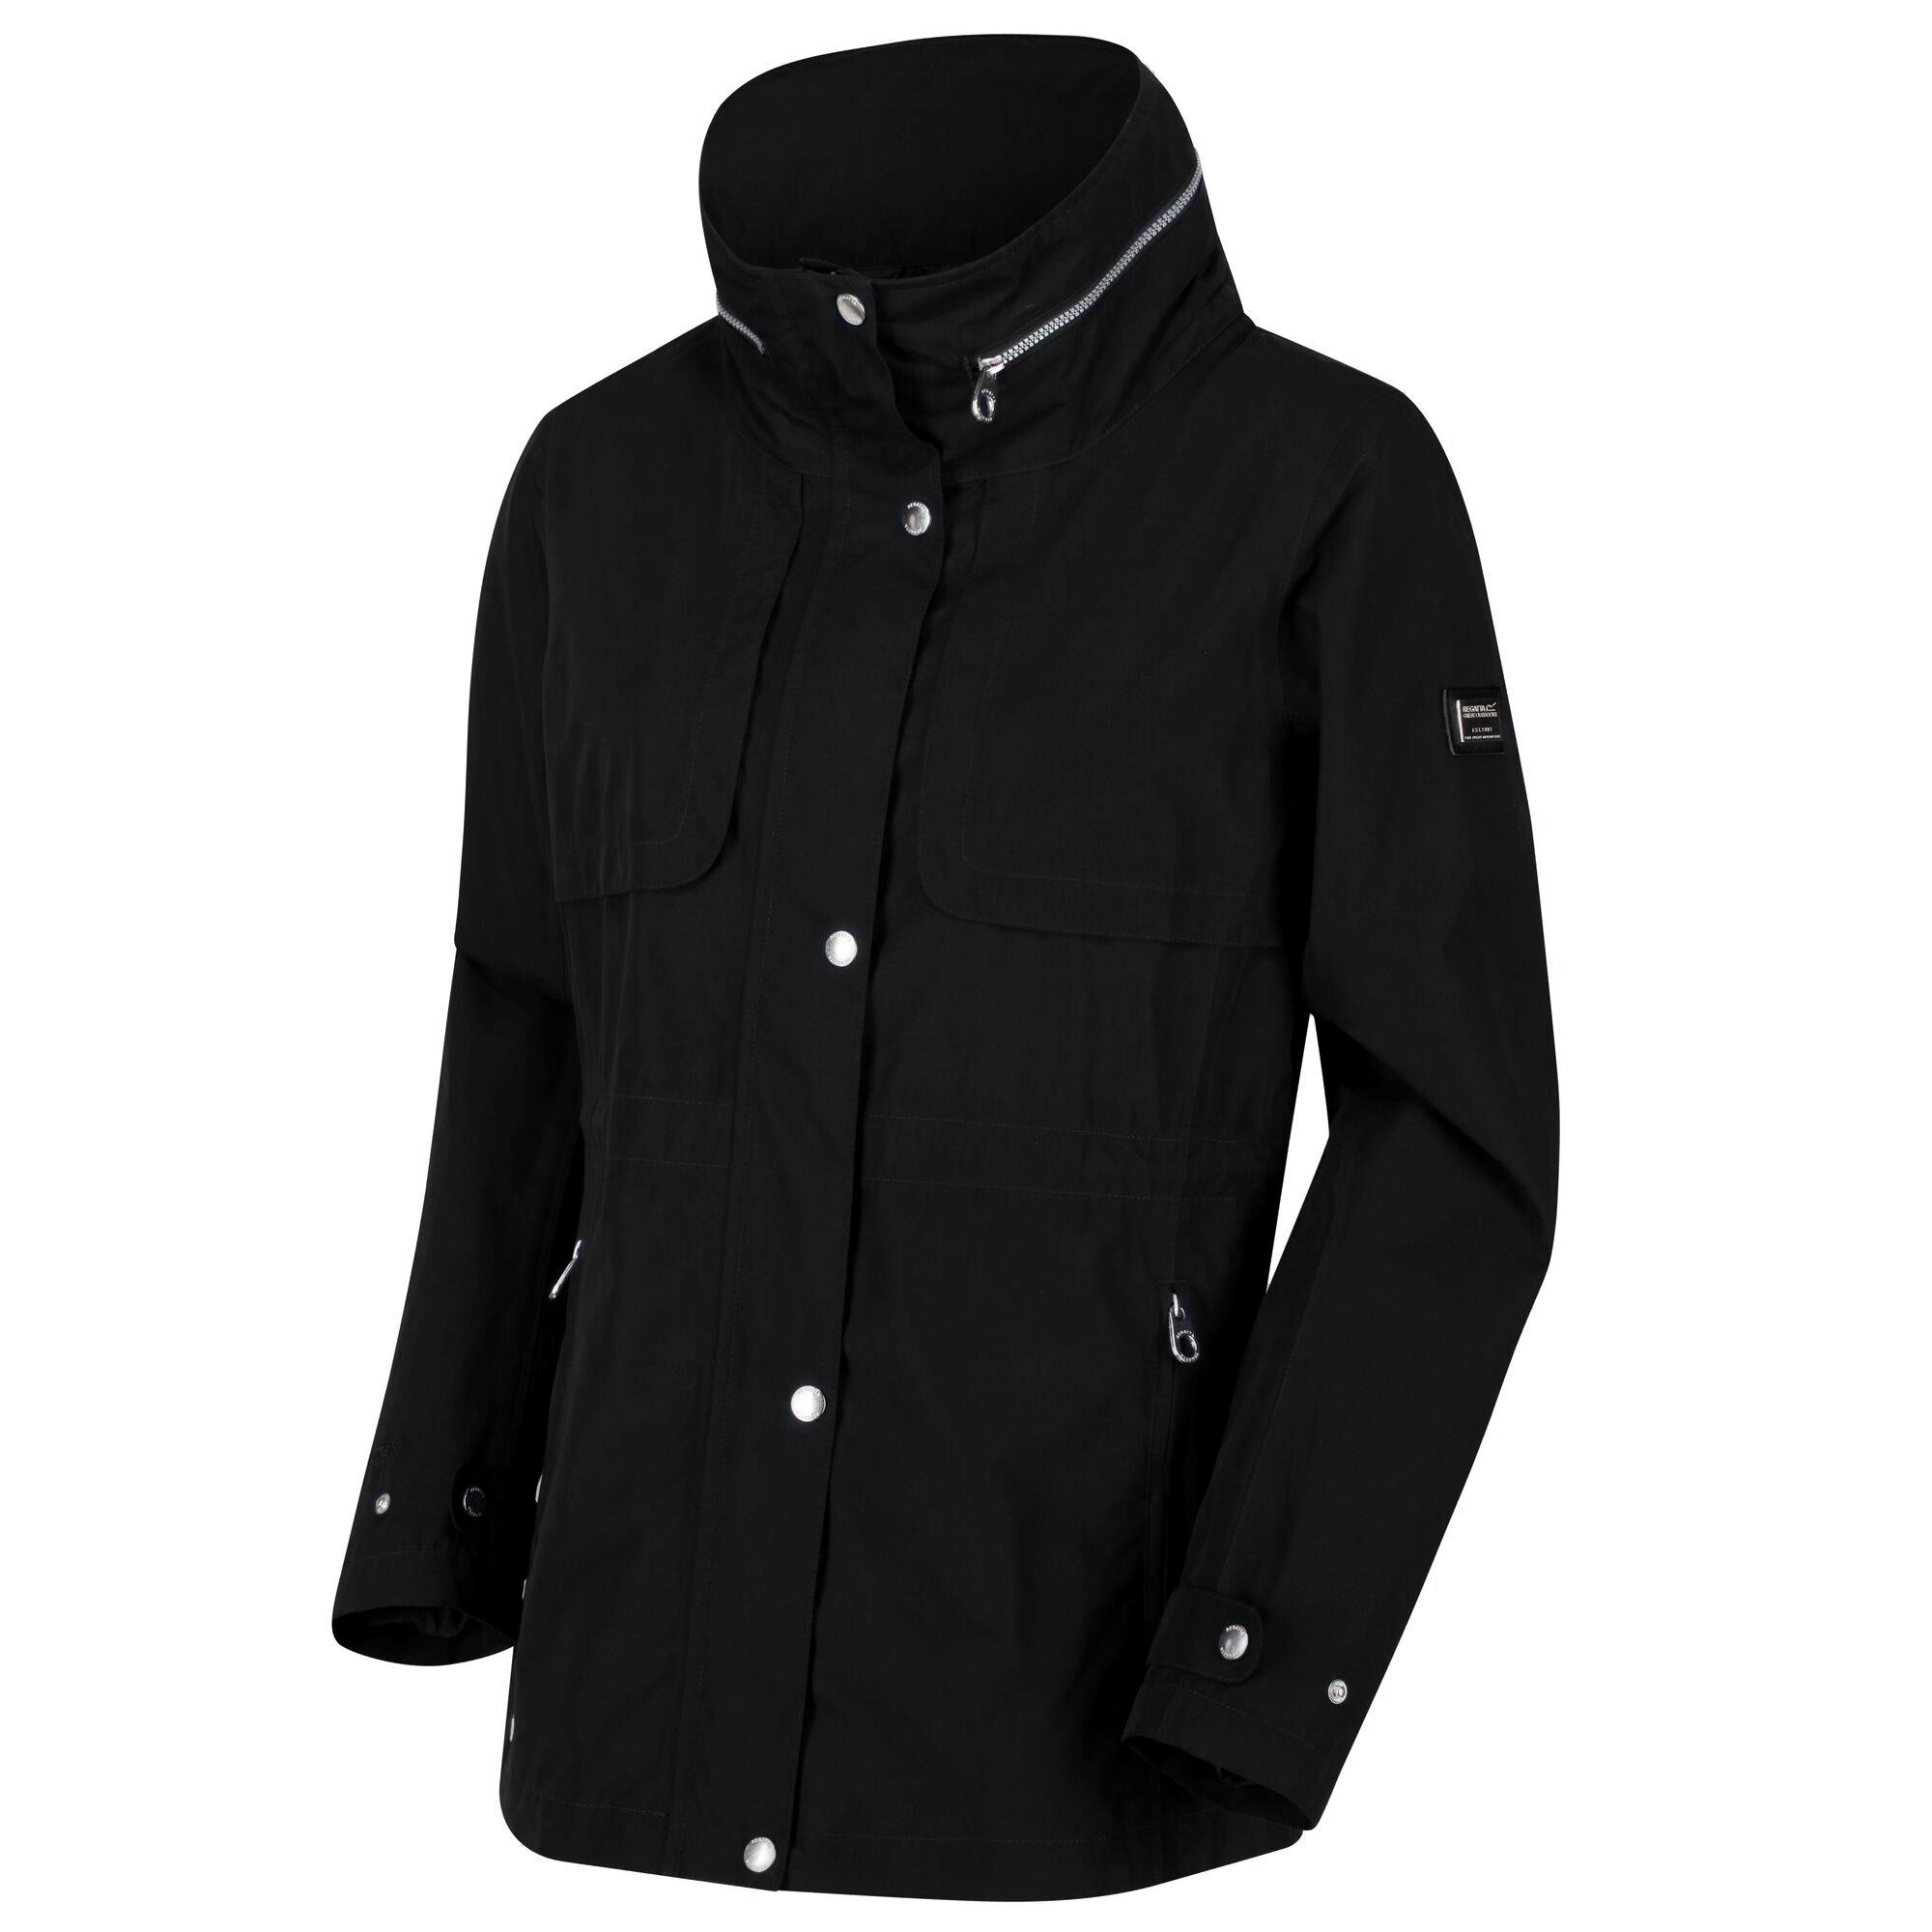 Regatta Womens/Ladies Narelle Waterproof Funnel Neck Jacket (10 UK) (Black)